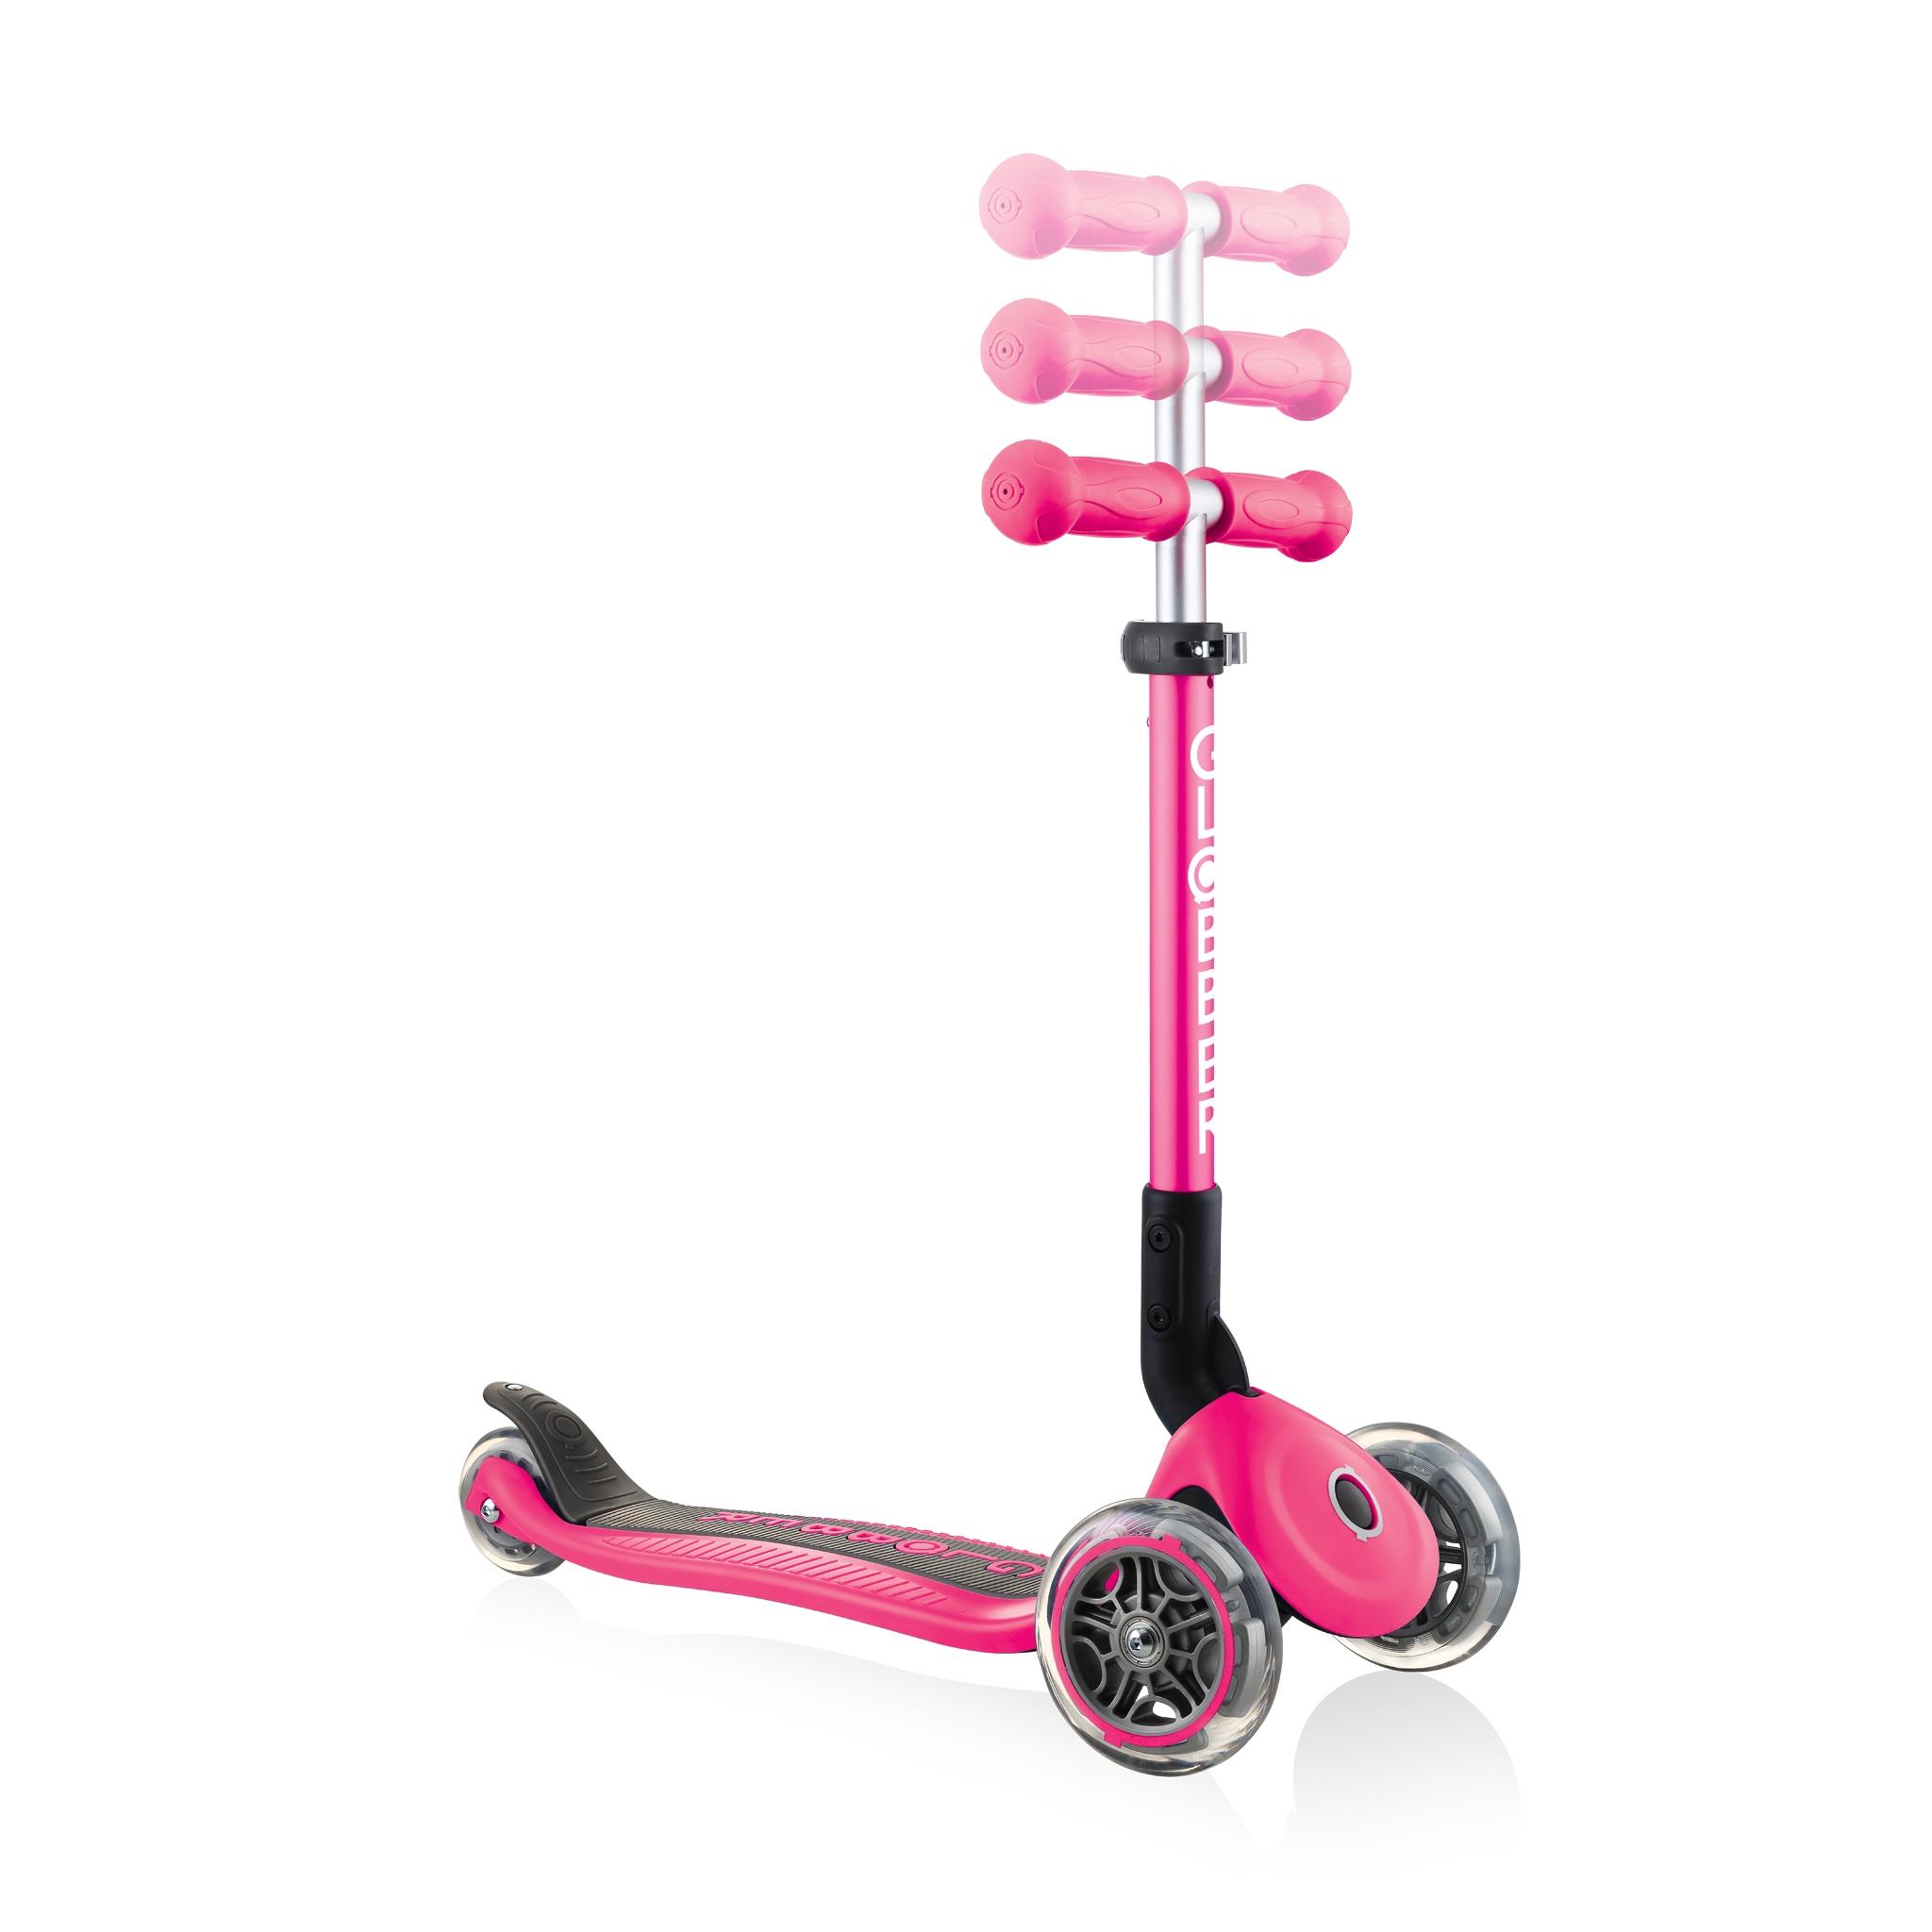 adjustable-3-wheel-scooter-for-toddlers-Globber-JUNIOR-FOLDABLE 5